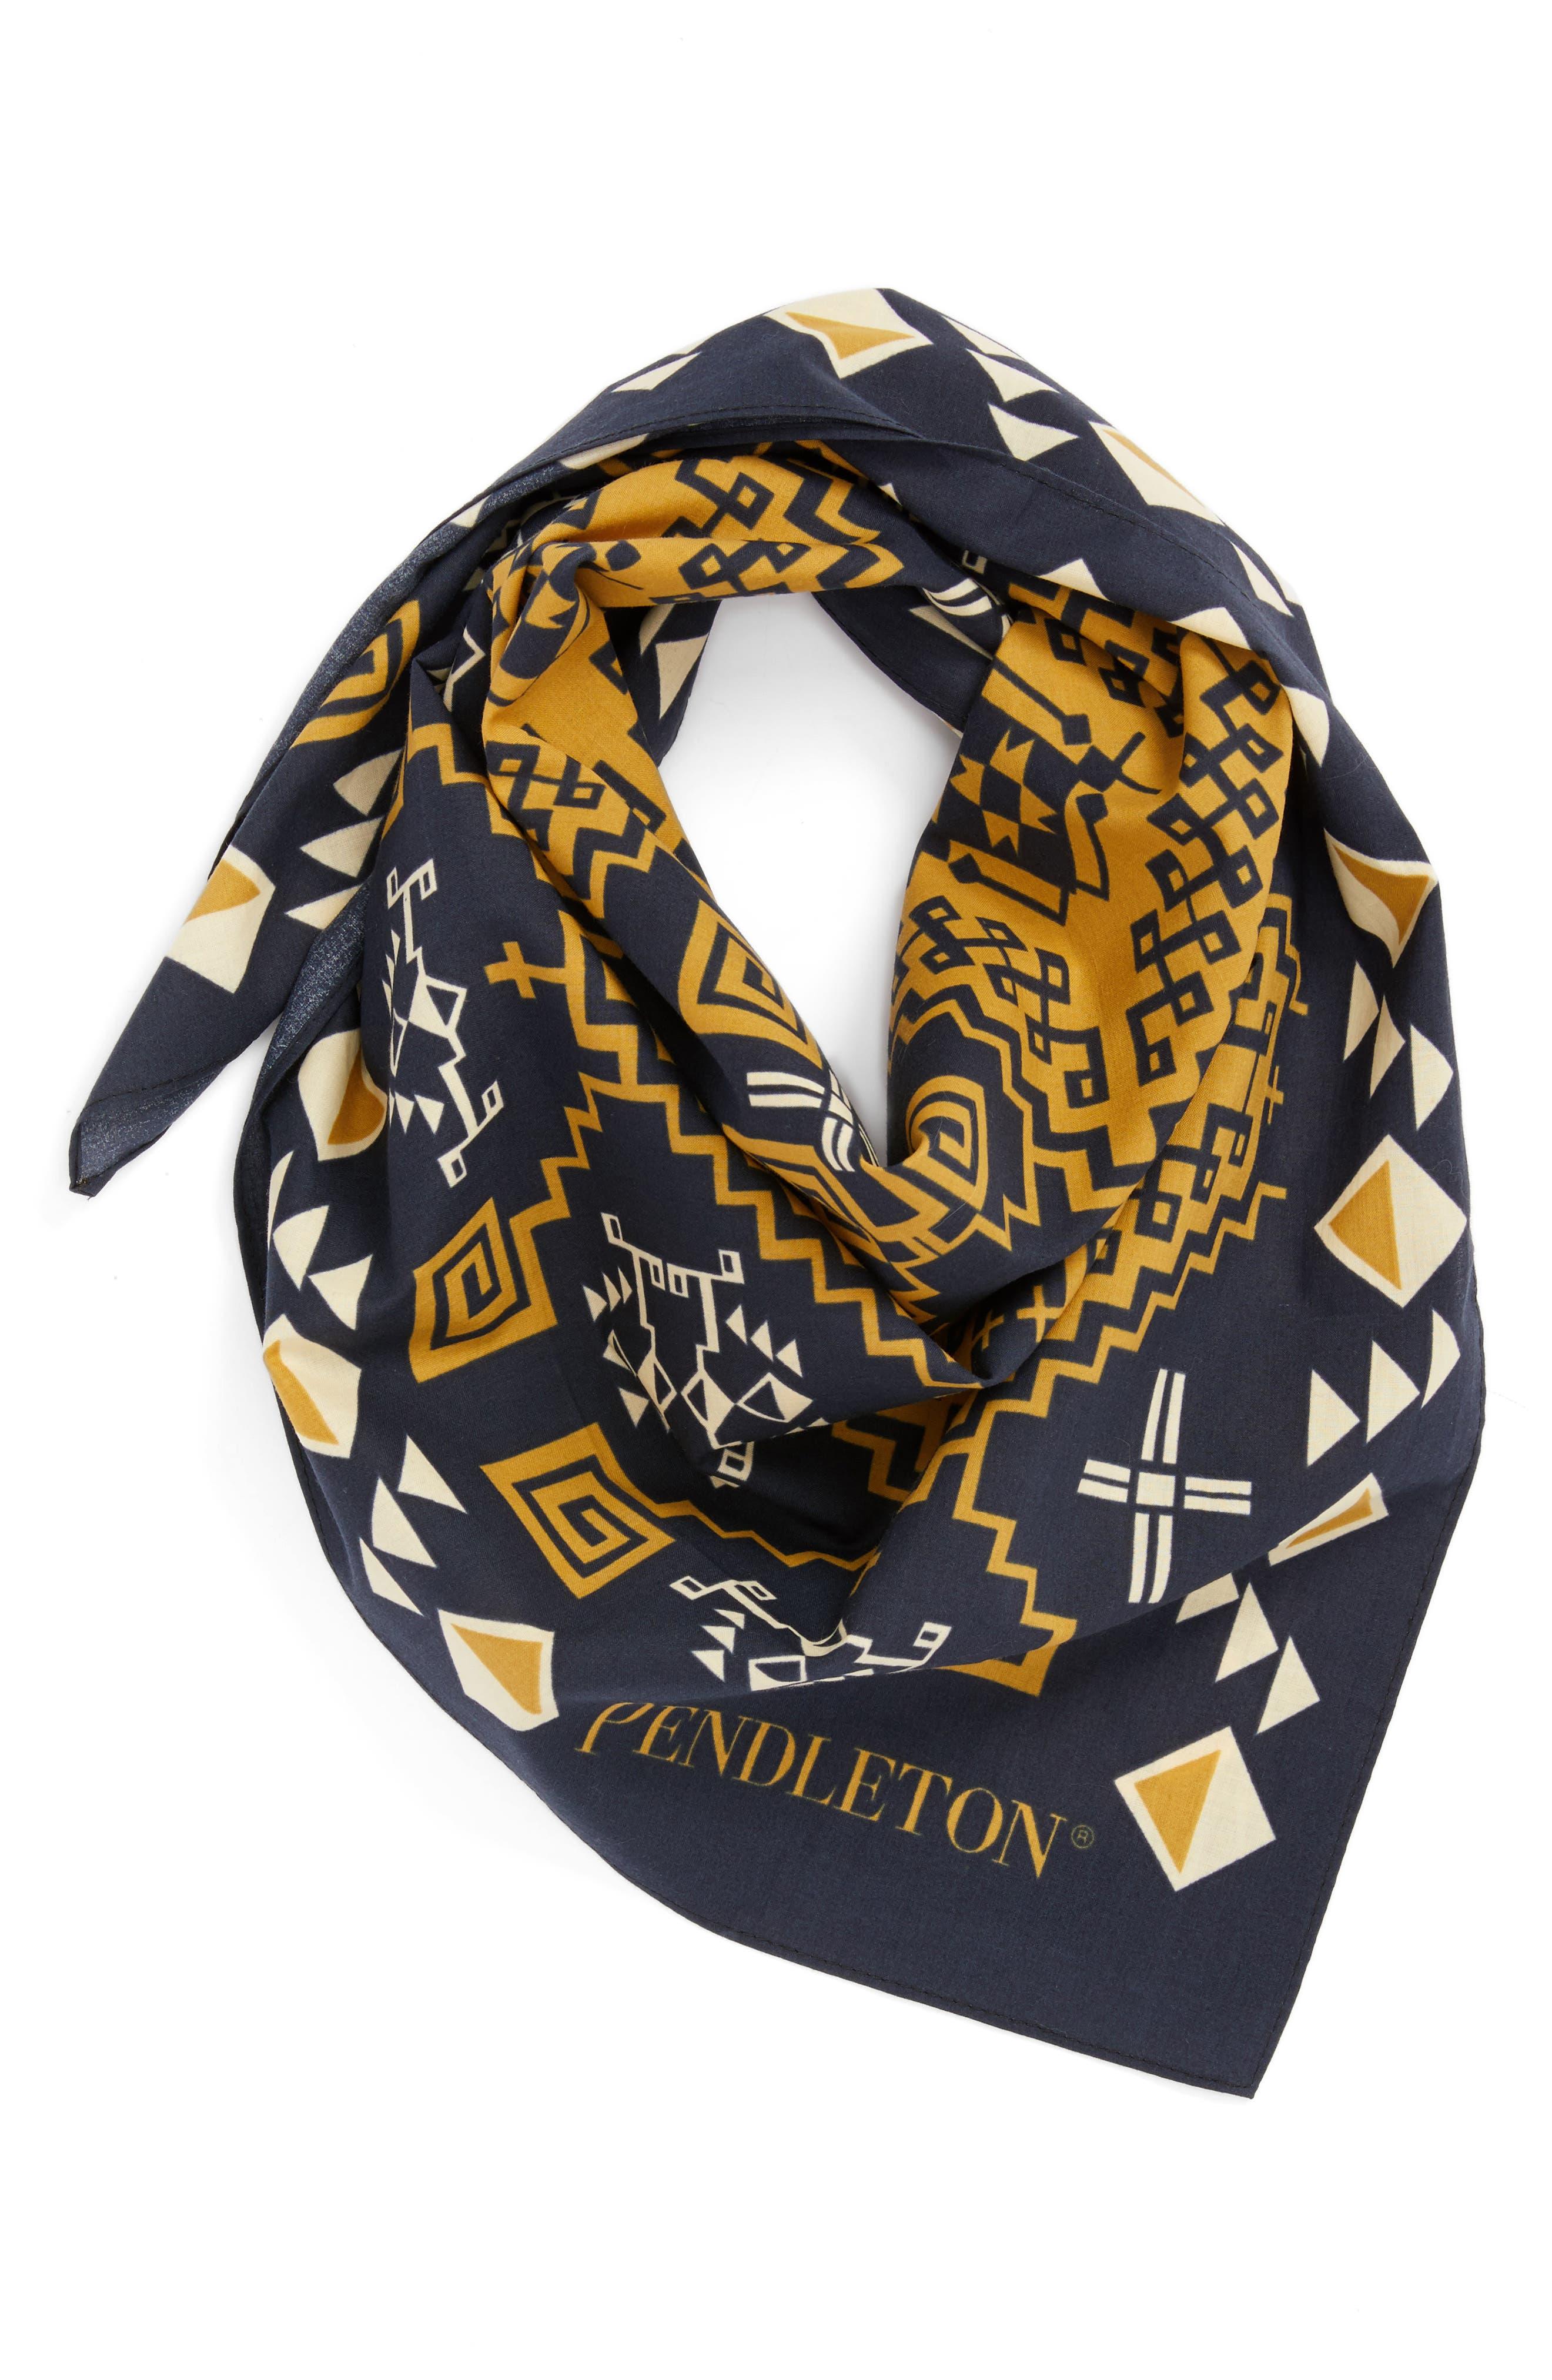 Main Image - Pendleton Jumbo Cotton Bandana